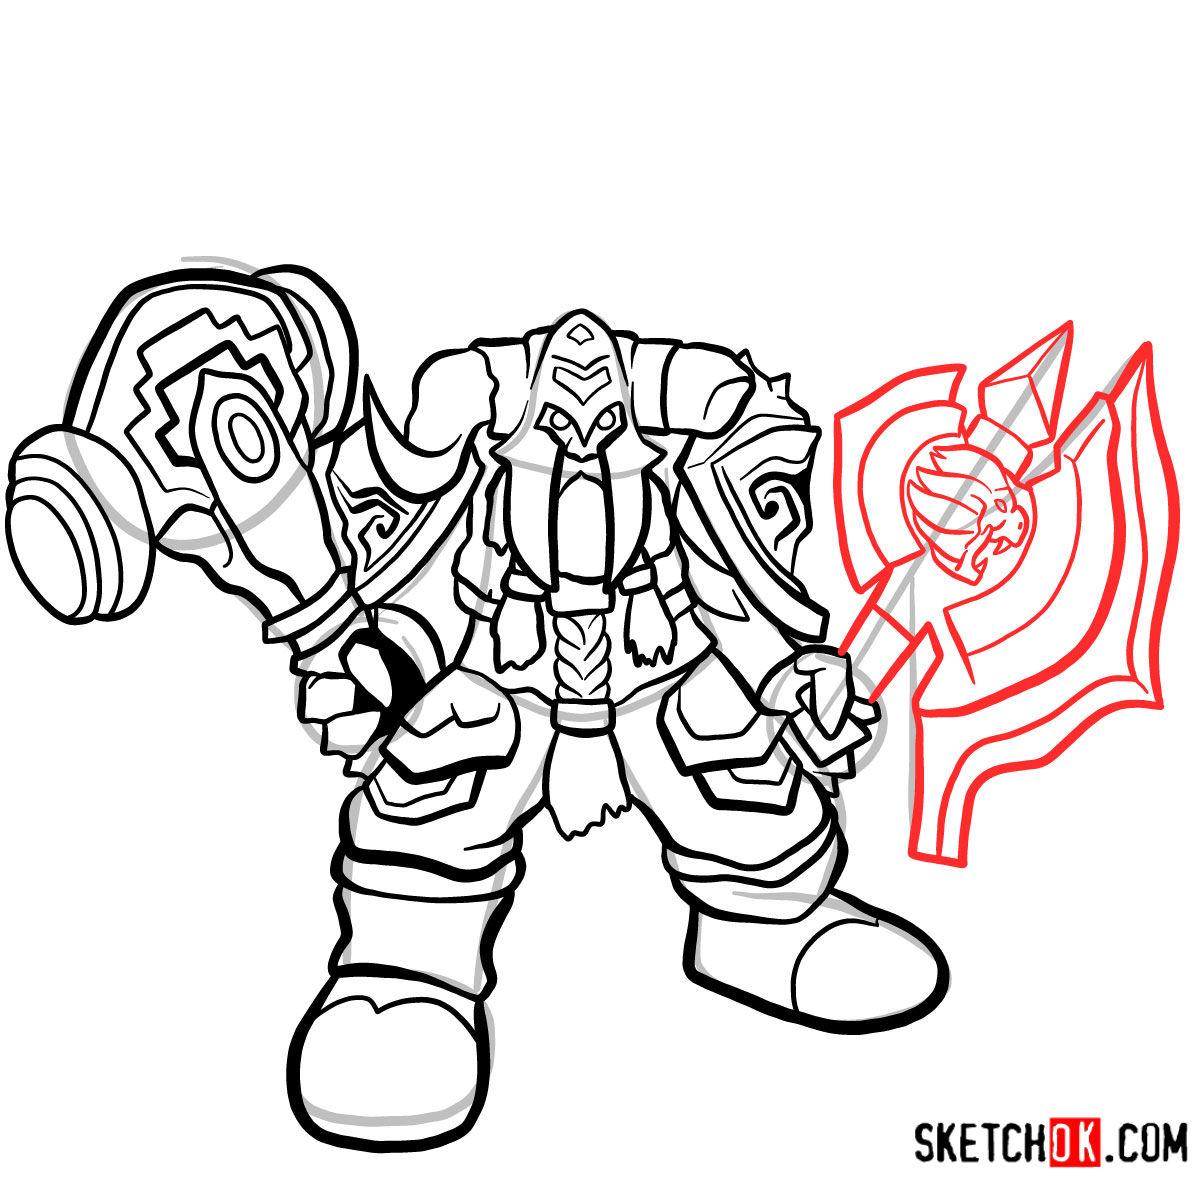 How to draw Muradin Bronzebeard | World of Warcraft - step 11